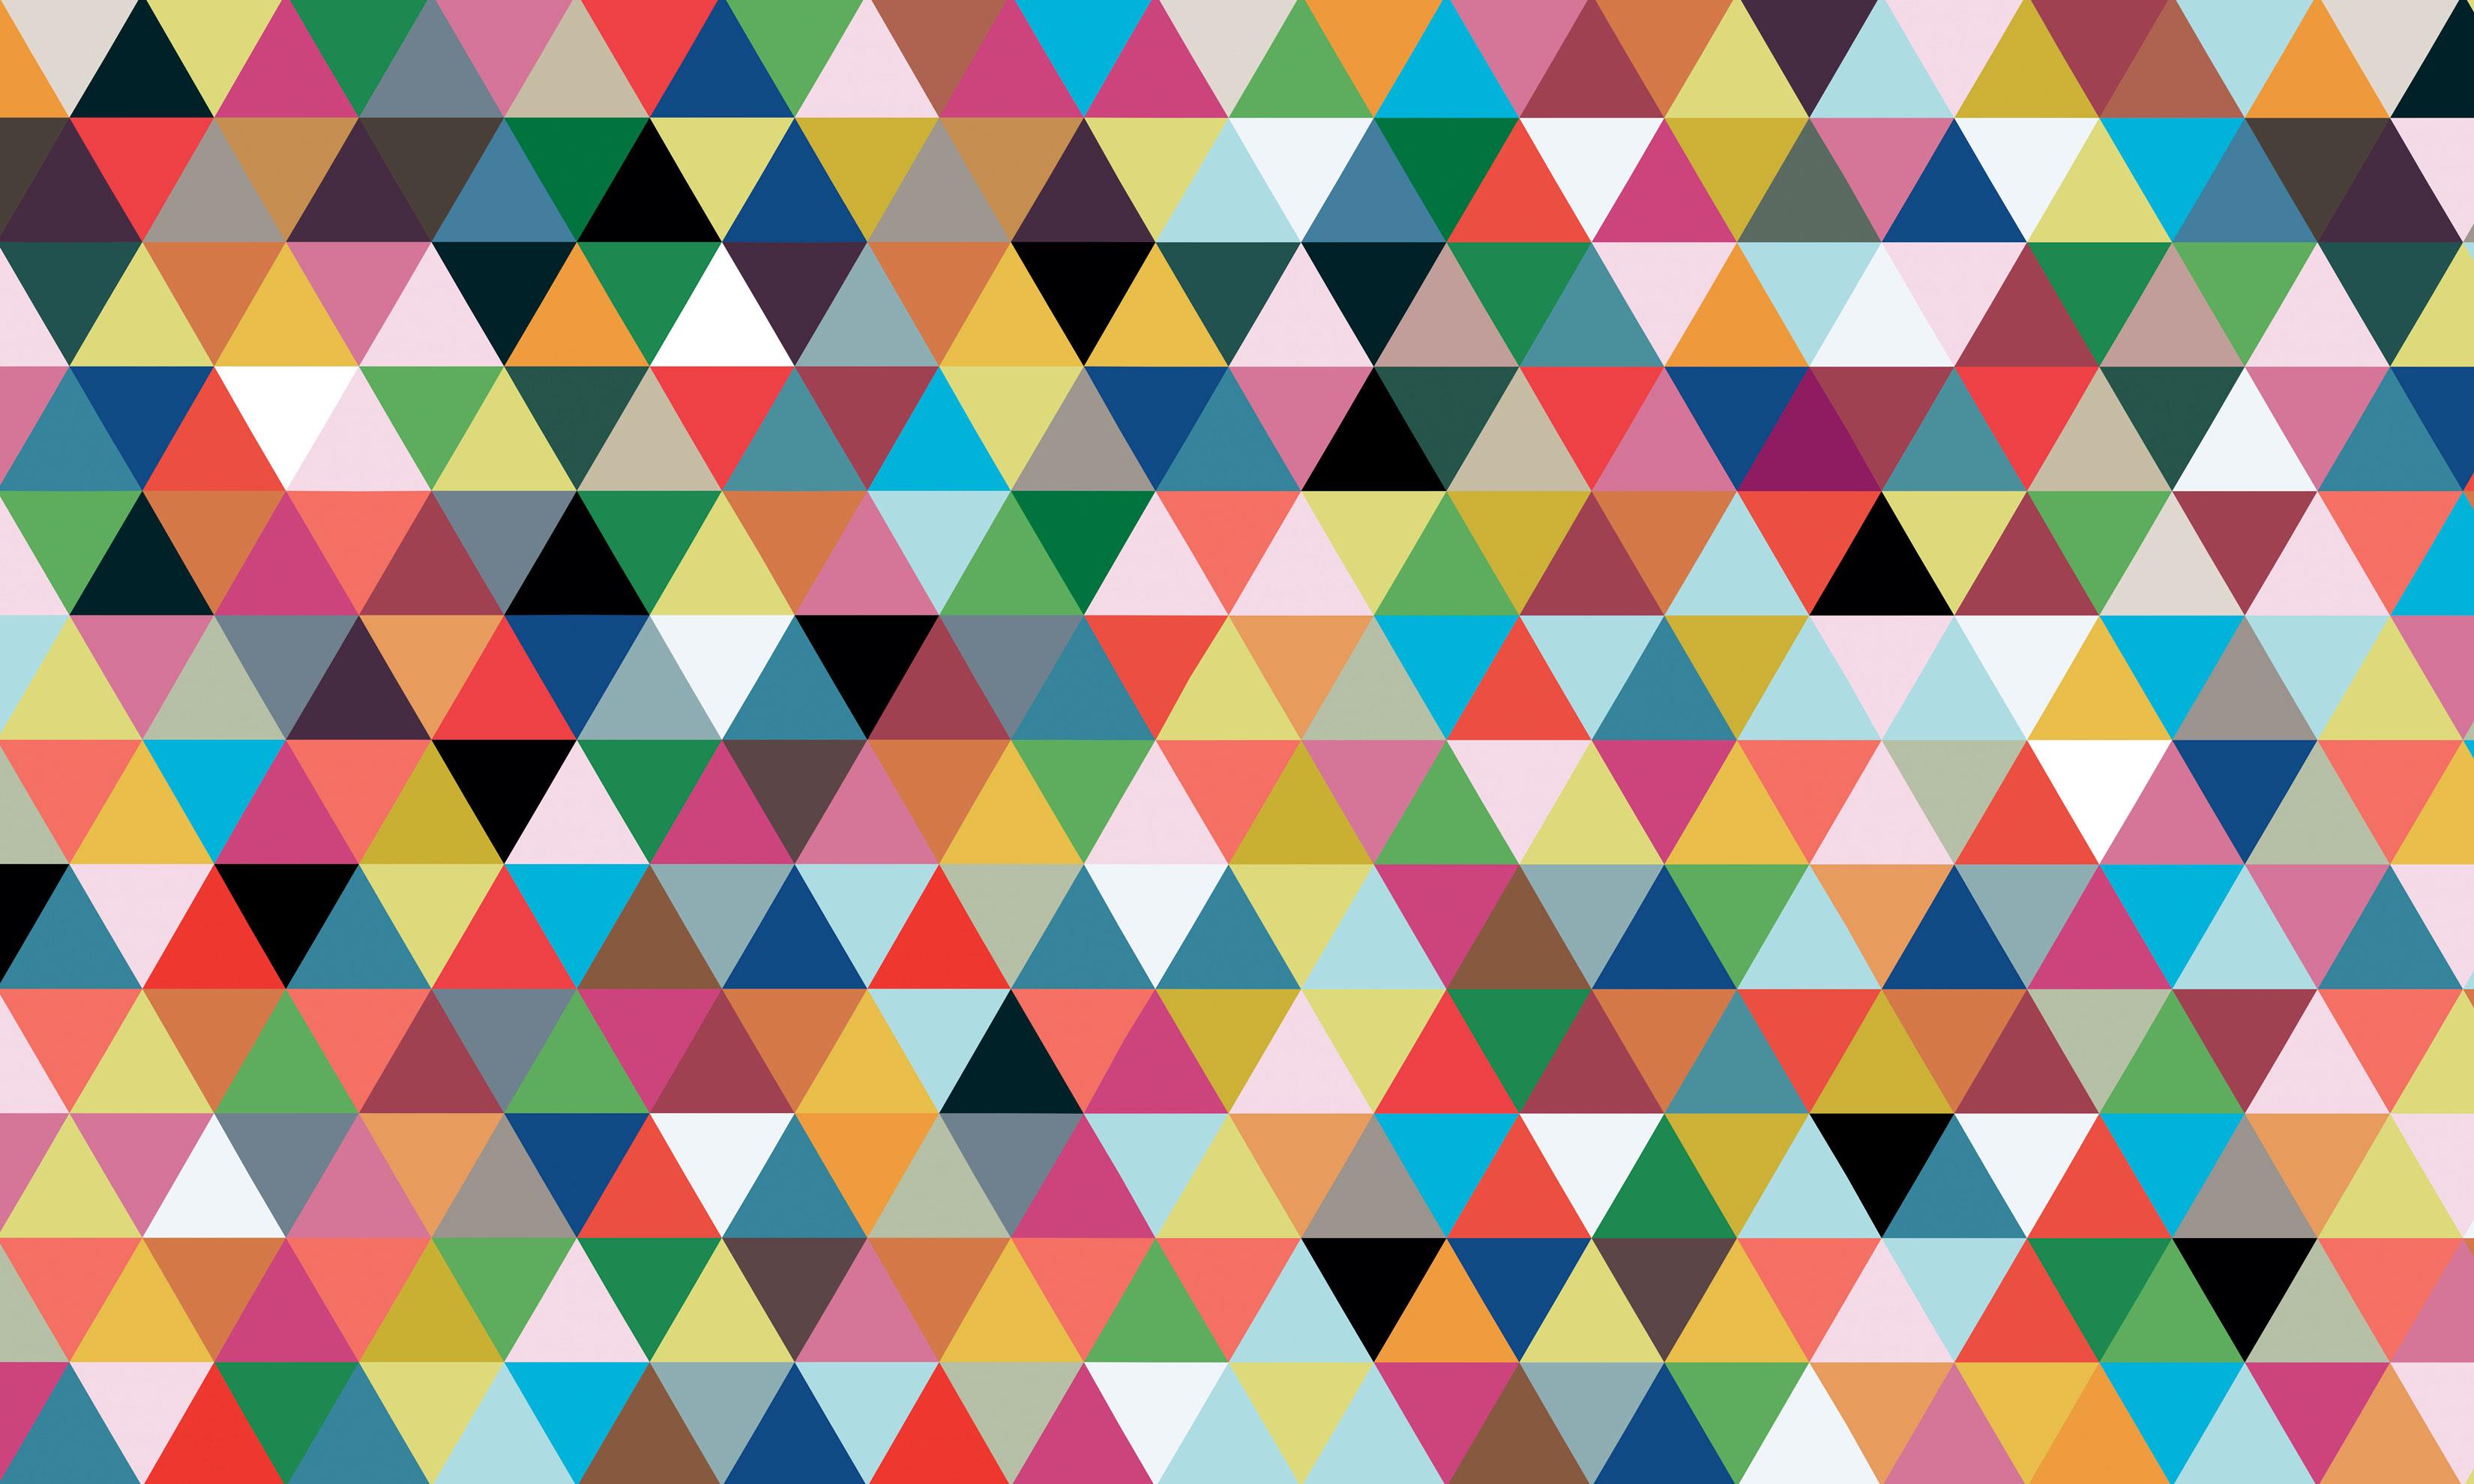 download Geometric Triangle Wallpaper Wallpaper triangles 3300x1980